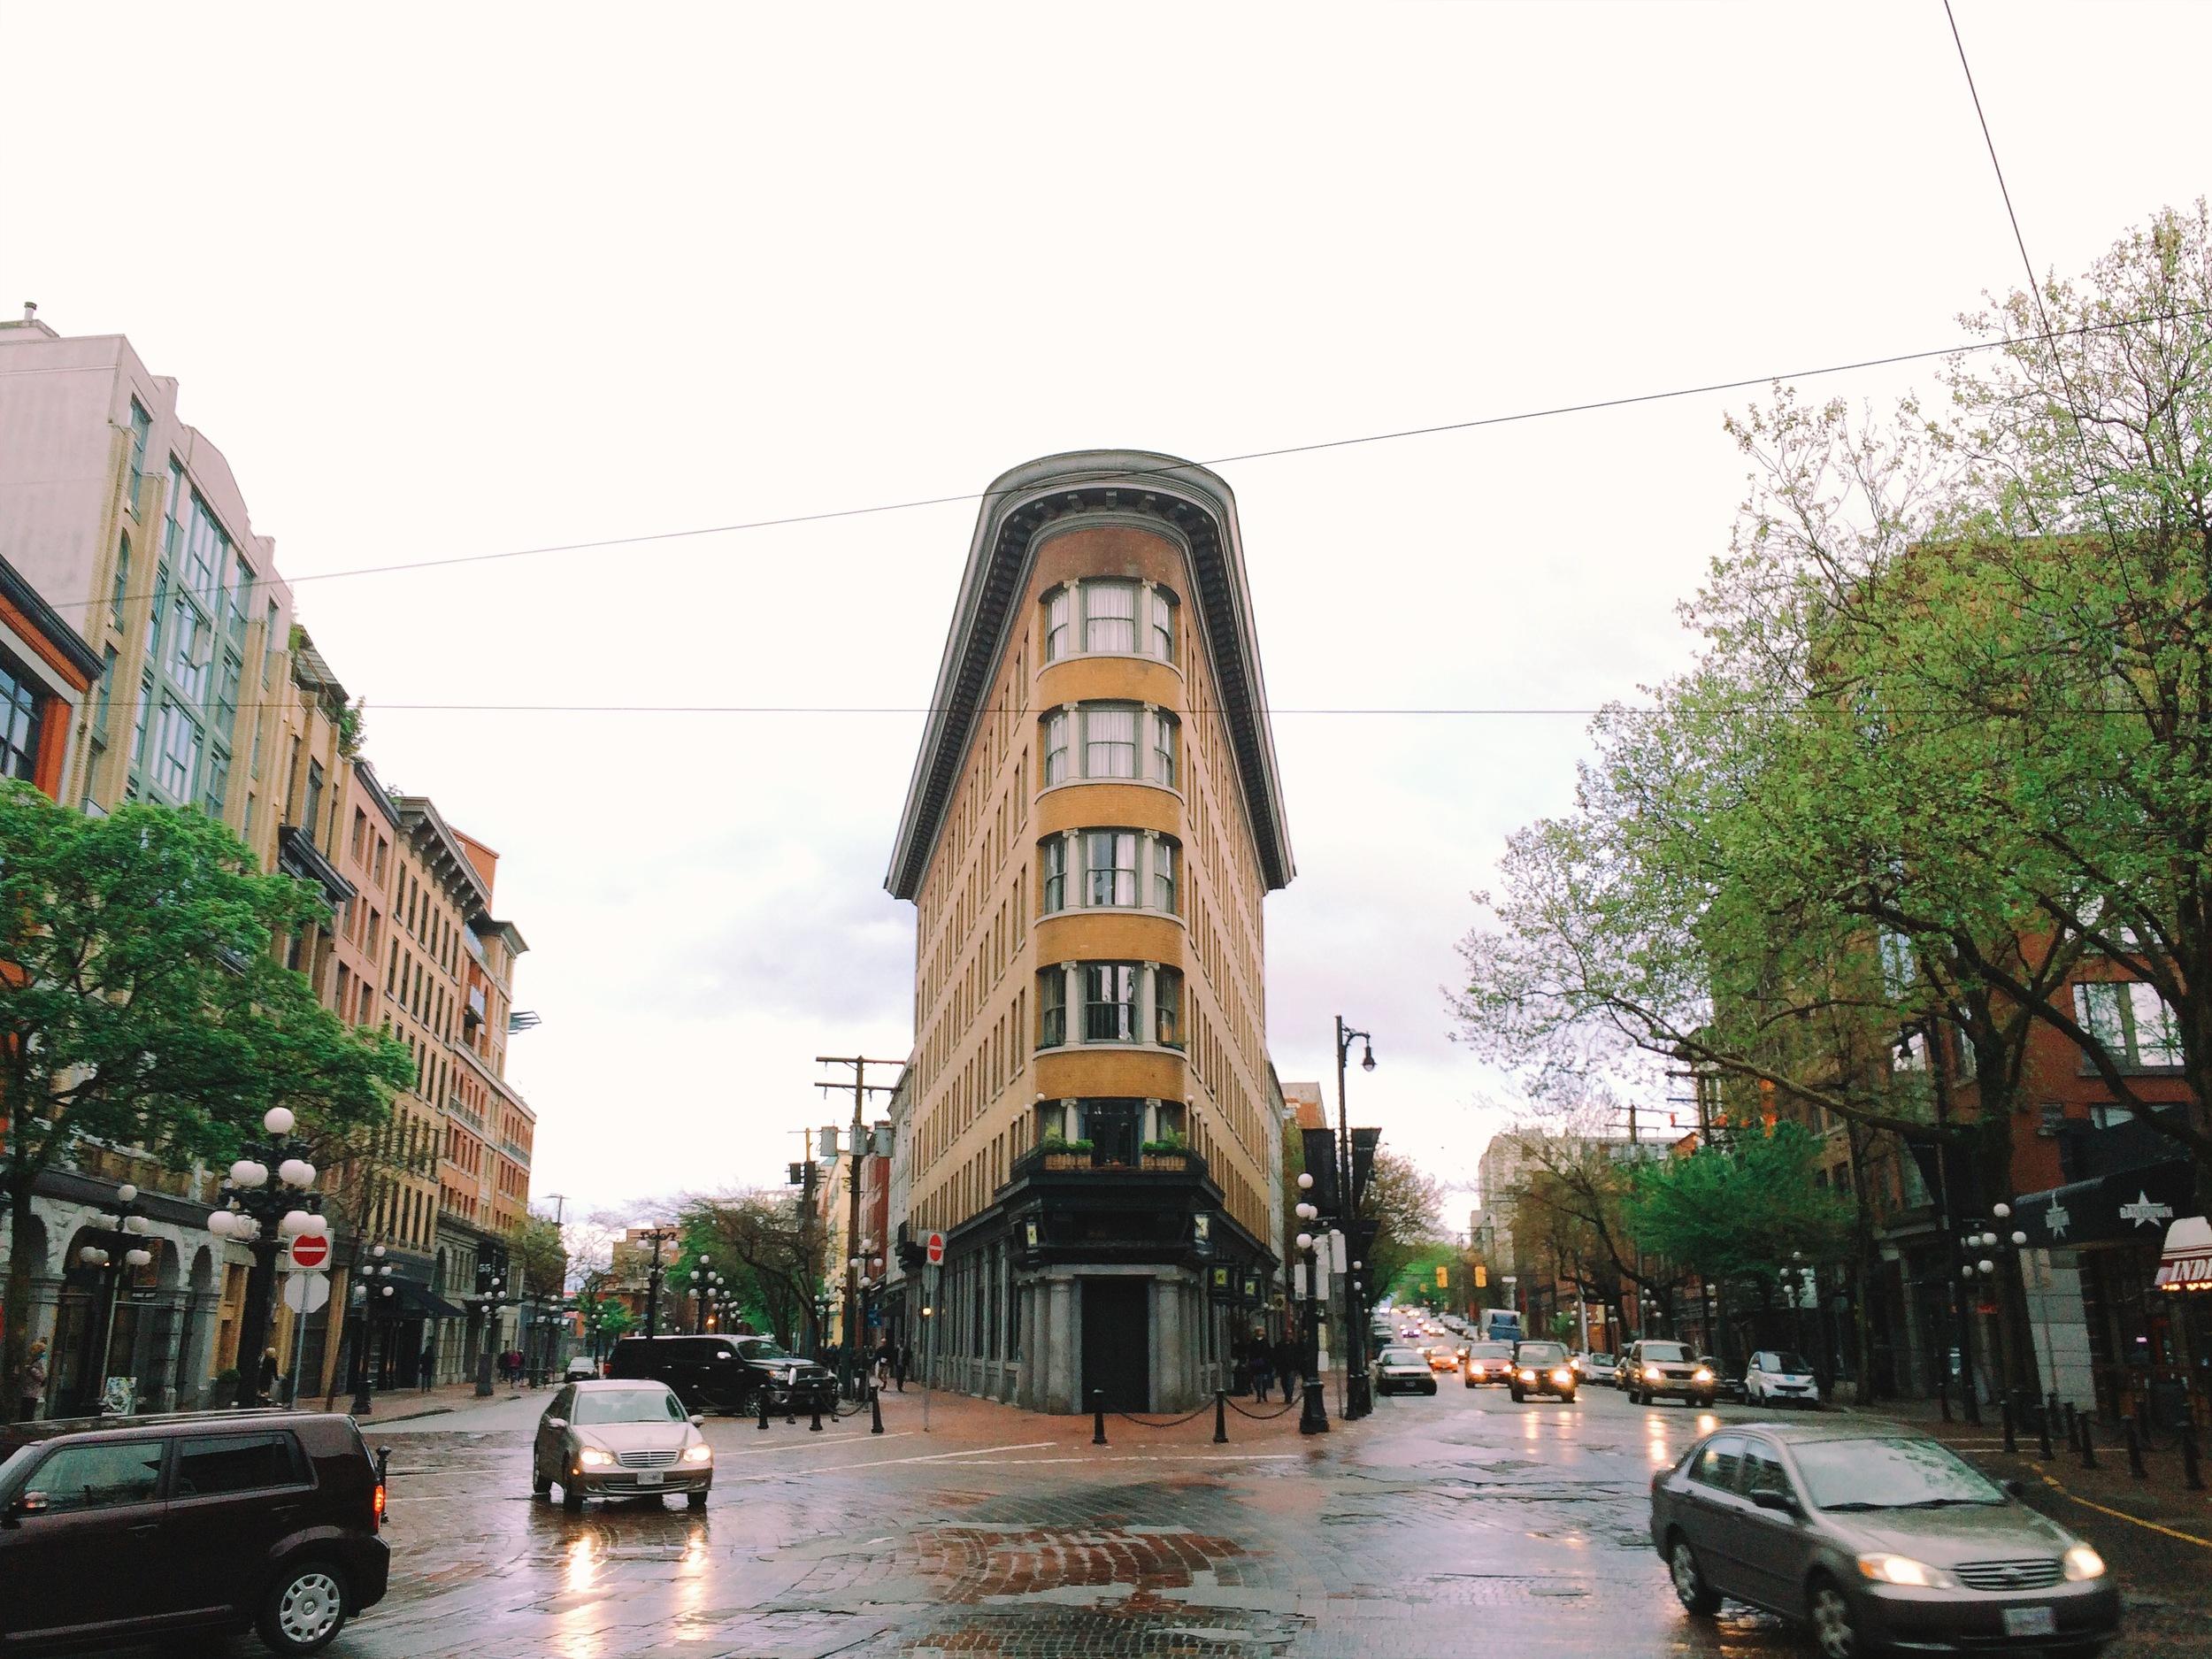 Vancouver's own Flatiron Building. HAHA